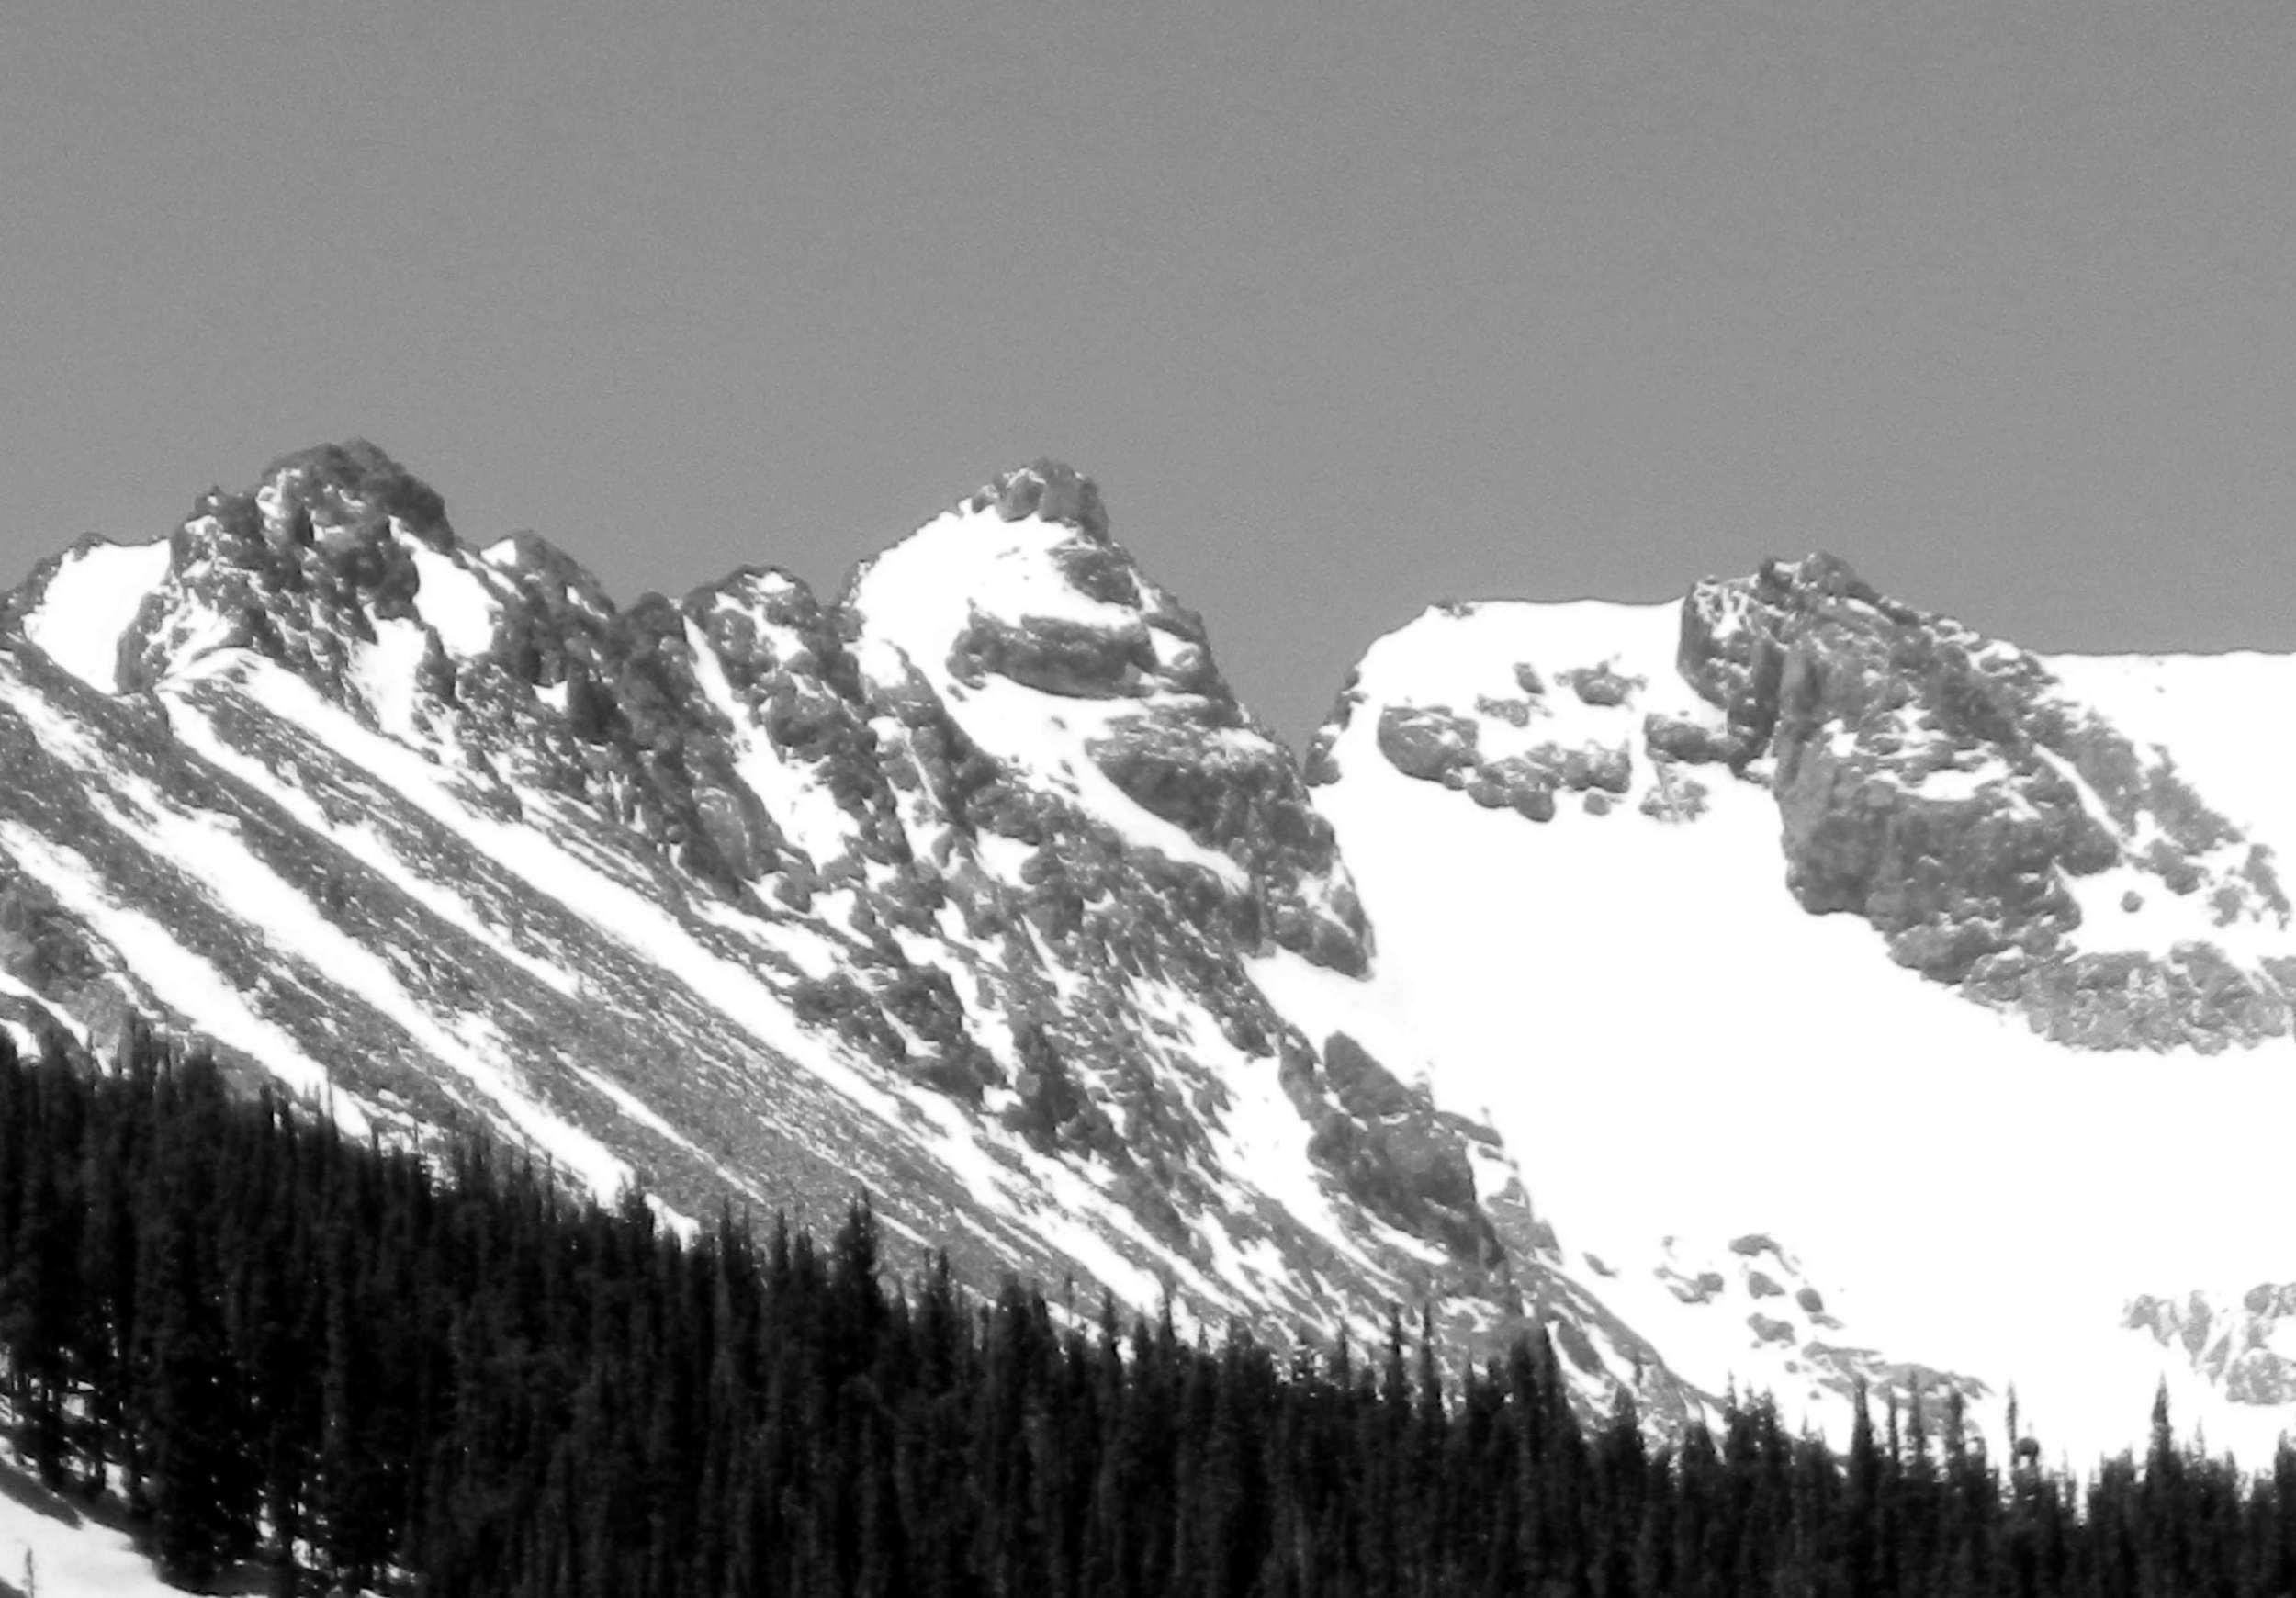 Navajo Snowfield and Navajo Peak from Brainard Lake.